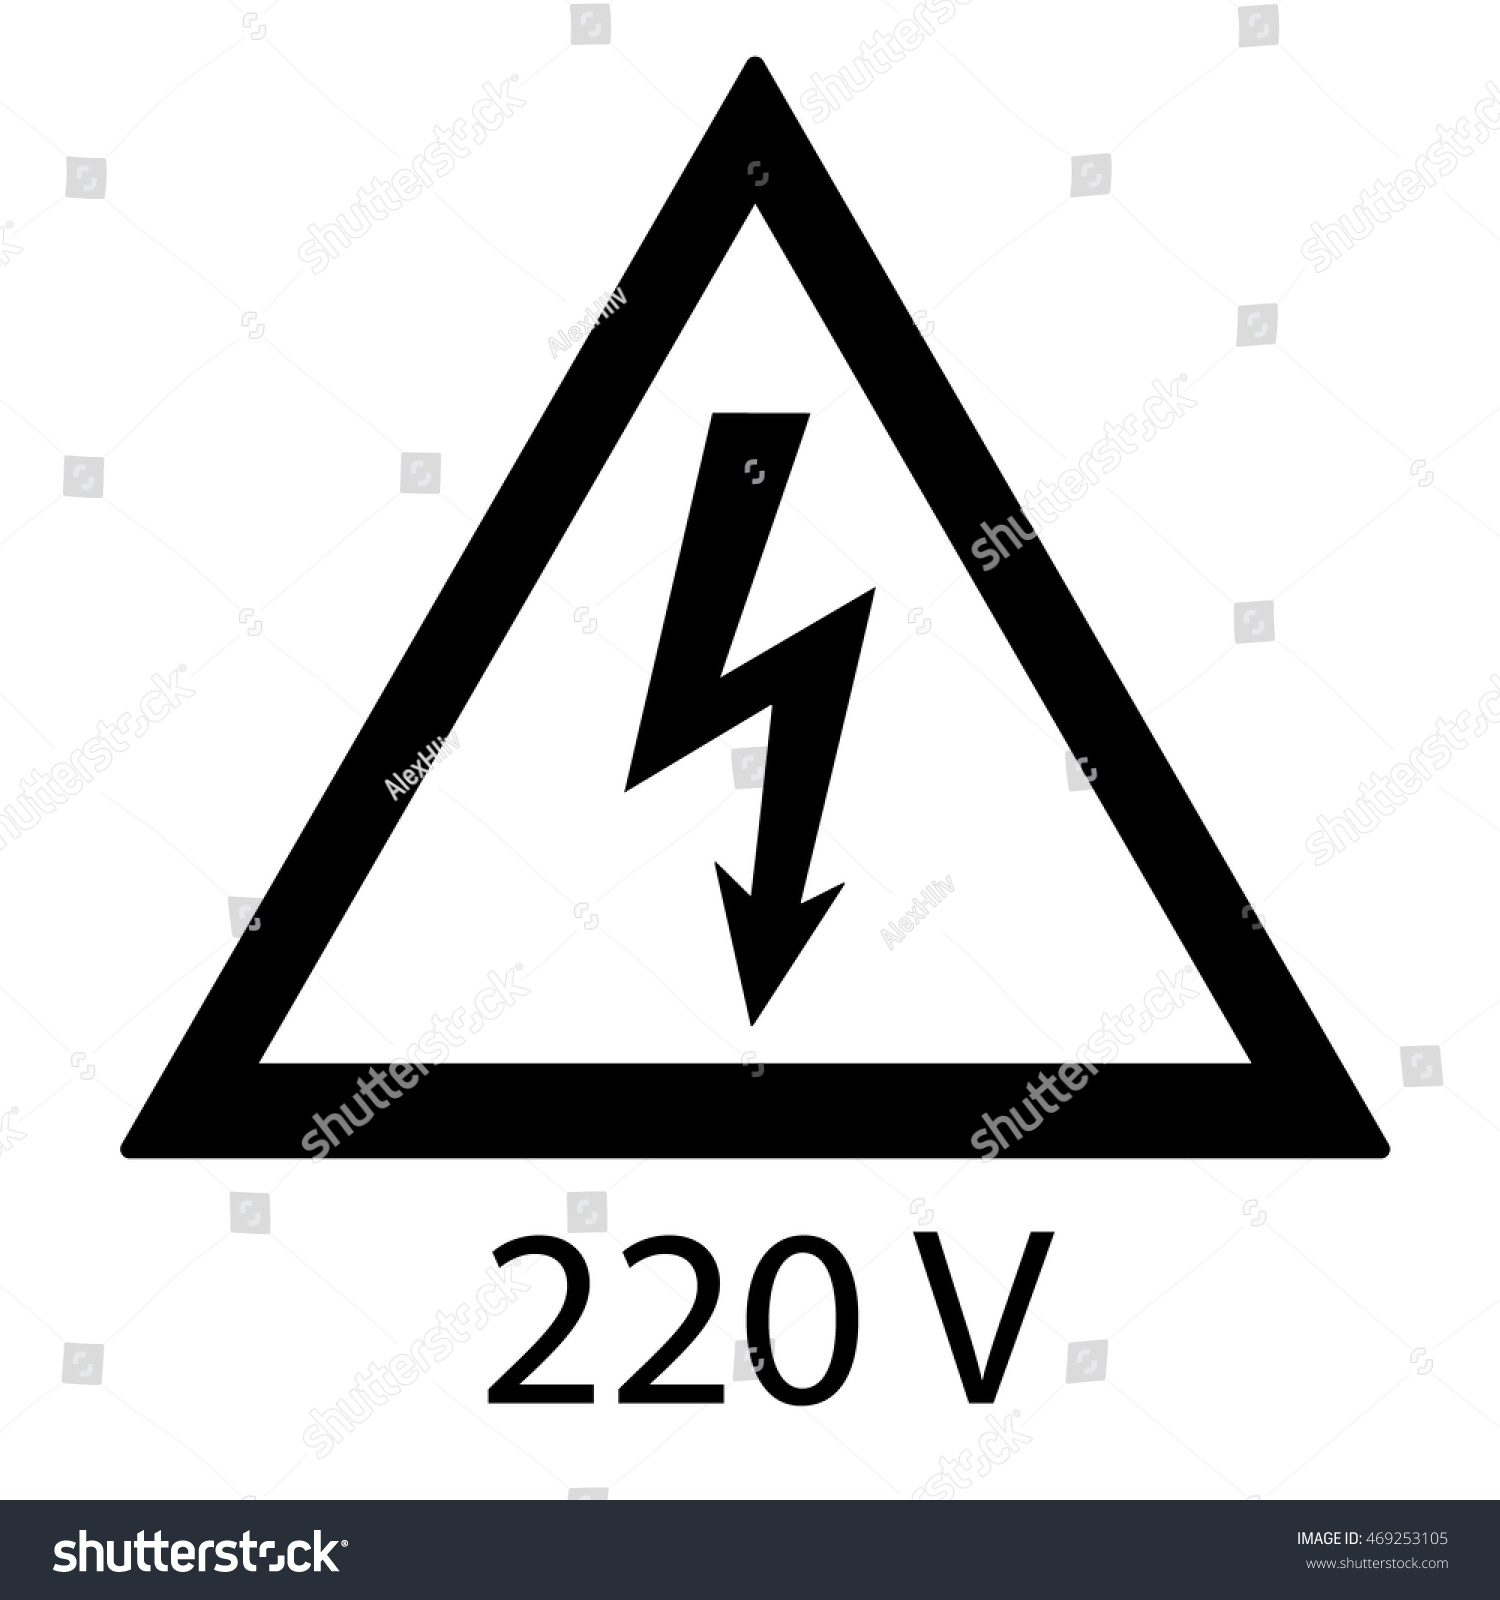 High Voltage Sign 220 Volt Danger Stock Vector 469253105 - Shutterstock